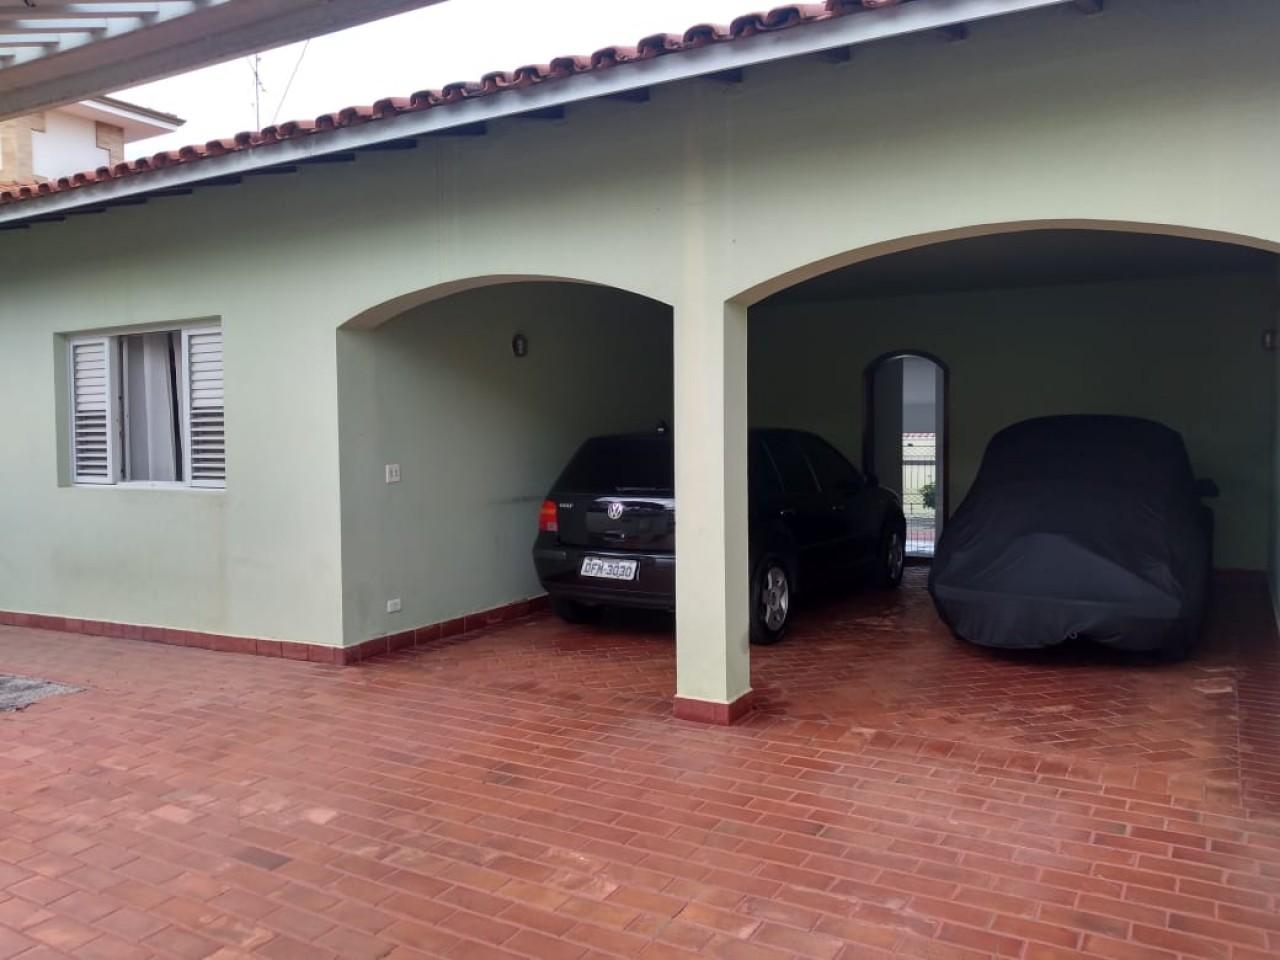 Casa Santa Cecília Piracicaba - Foto 10 de 10